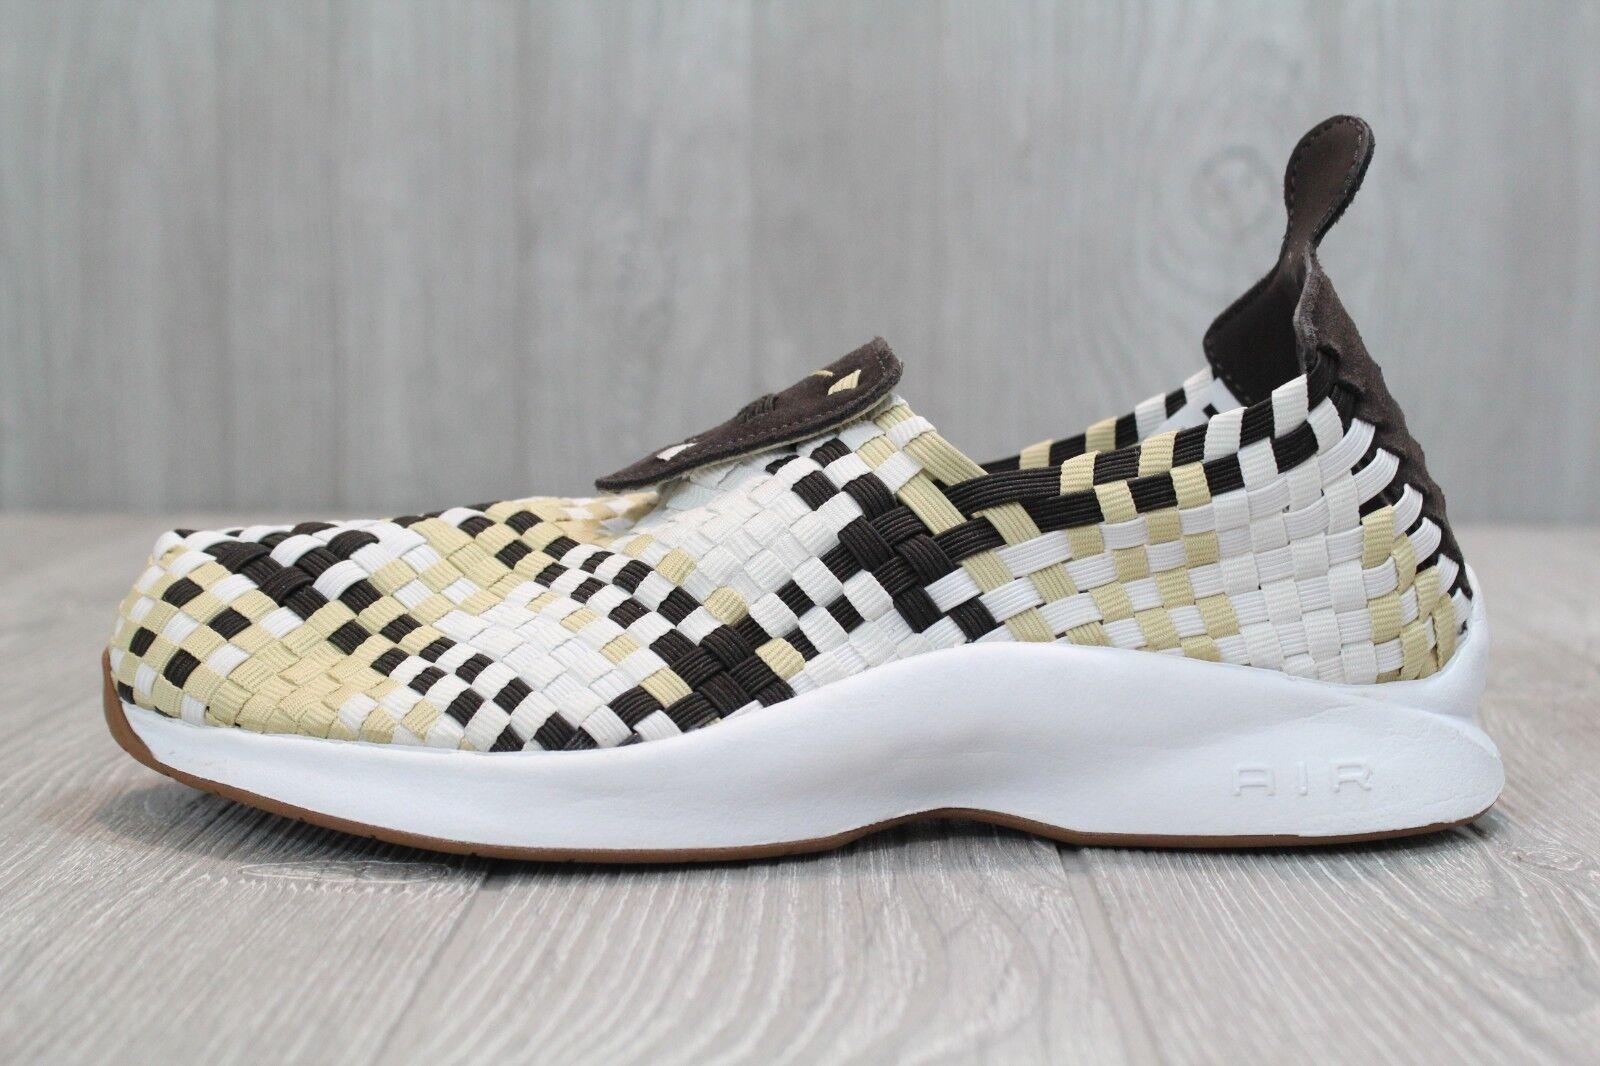 25 Nike Air Woven Velvet Brown Sail Mens 7 Classic Sneakers Slip-On 312422-200